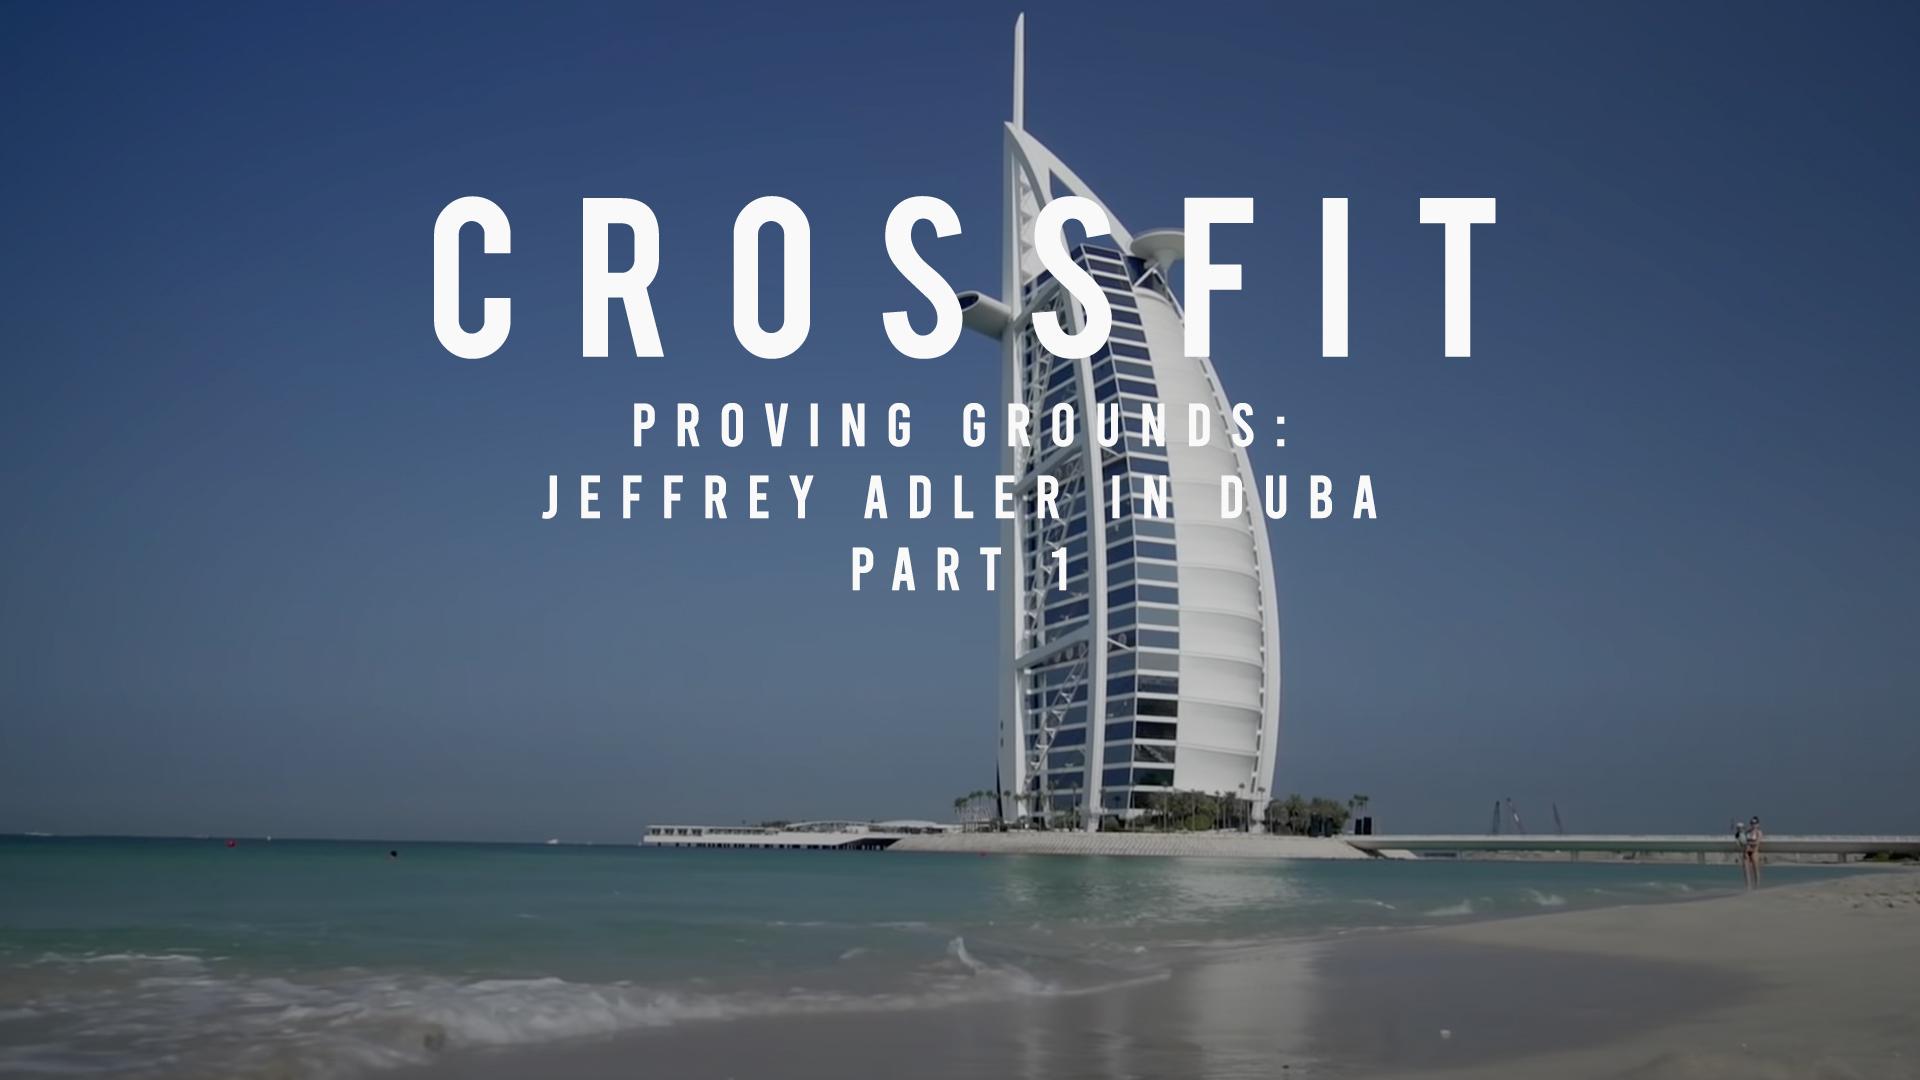 Proving Grounds: Jeffrey Adler in Dubai -- Part 1 Michael McCoy Videography